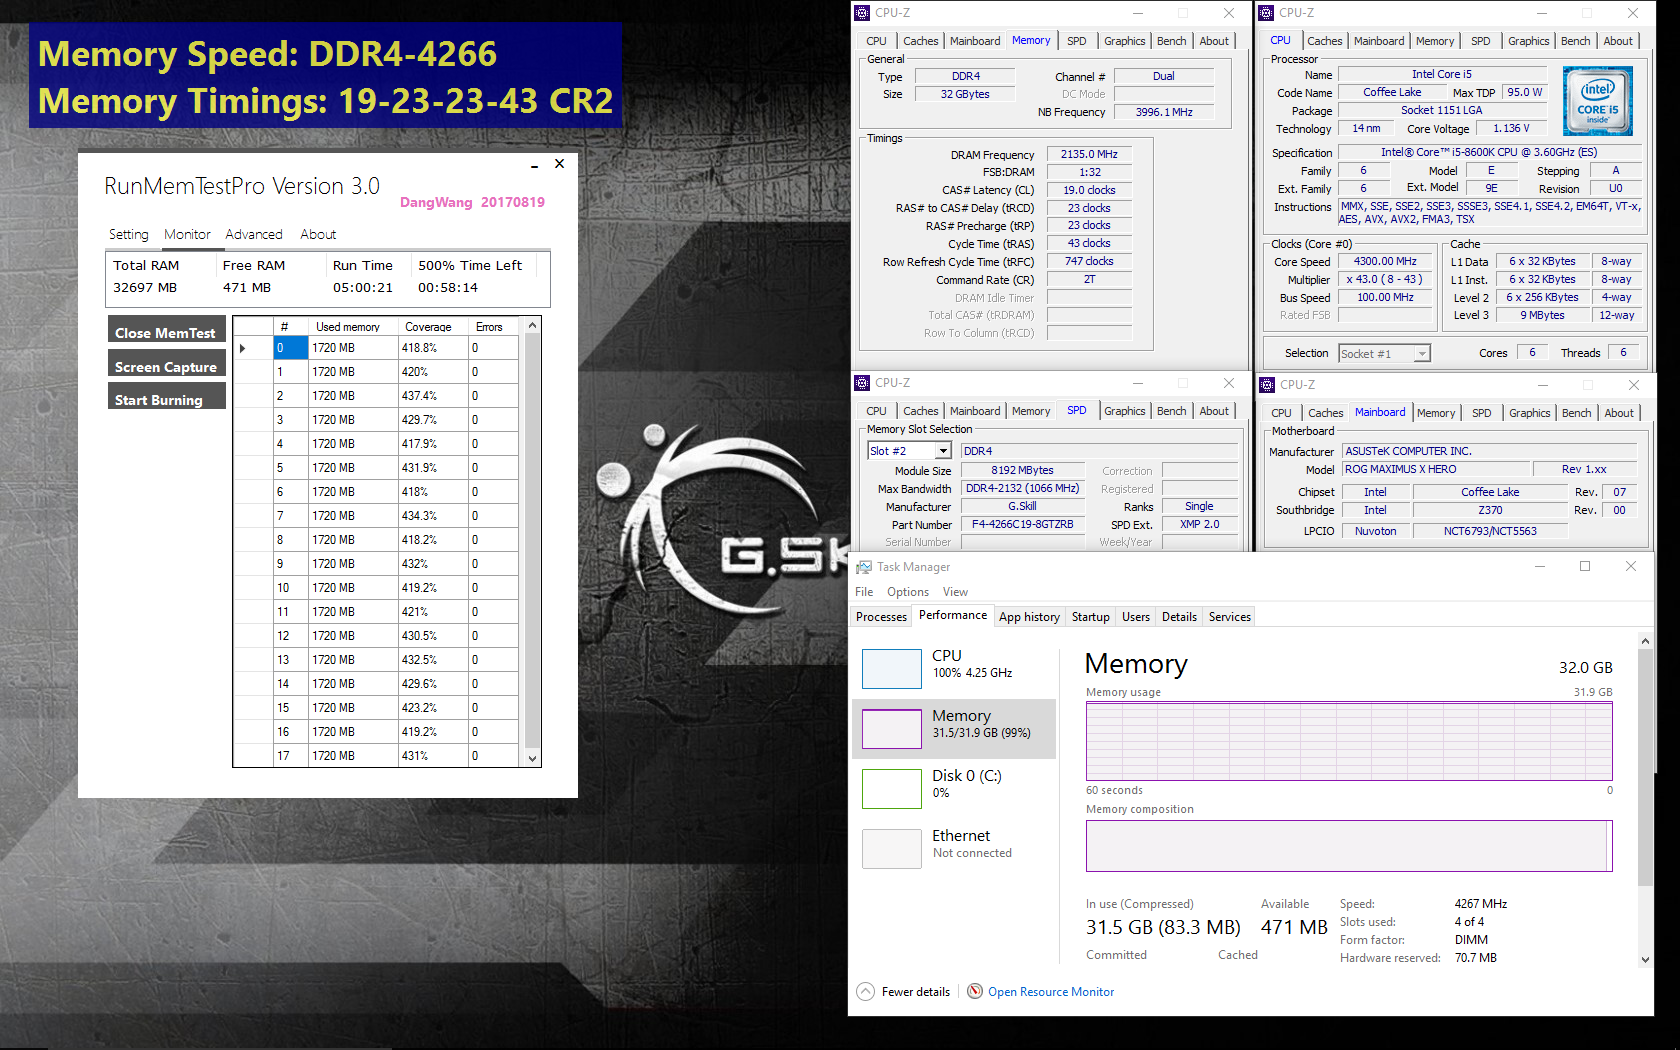 trident z rgb 4266 32gb 5hrs G.SKILL เปิดตัวแรมตัวแรงในรุ่น Trident Z RGB Memory Kit at DDR4 4266MHz ความจุ 32GB (4x8GB) รองรับการทำงานของซีพียู Intel 8th Gen Coffee Lake รุ่นใหม่ล่าสุด